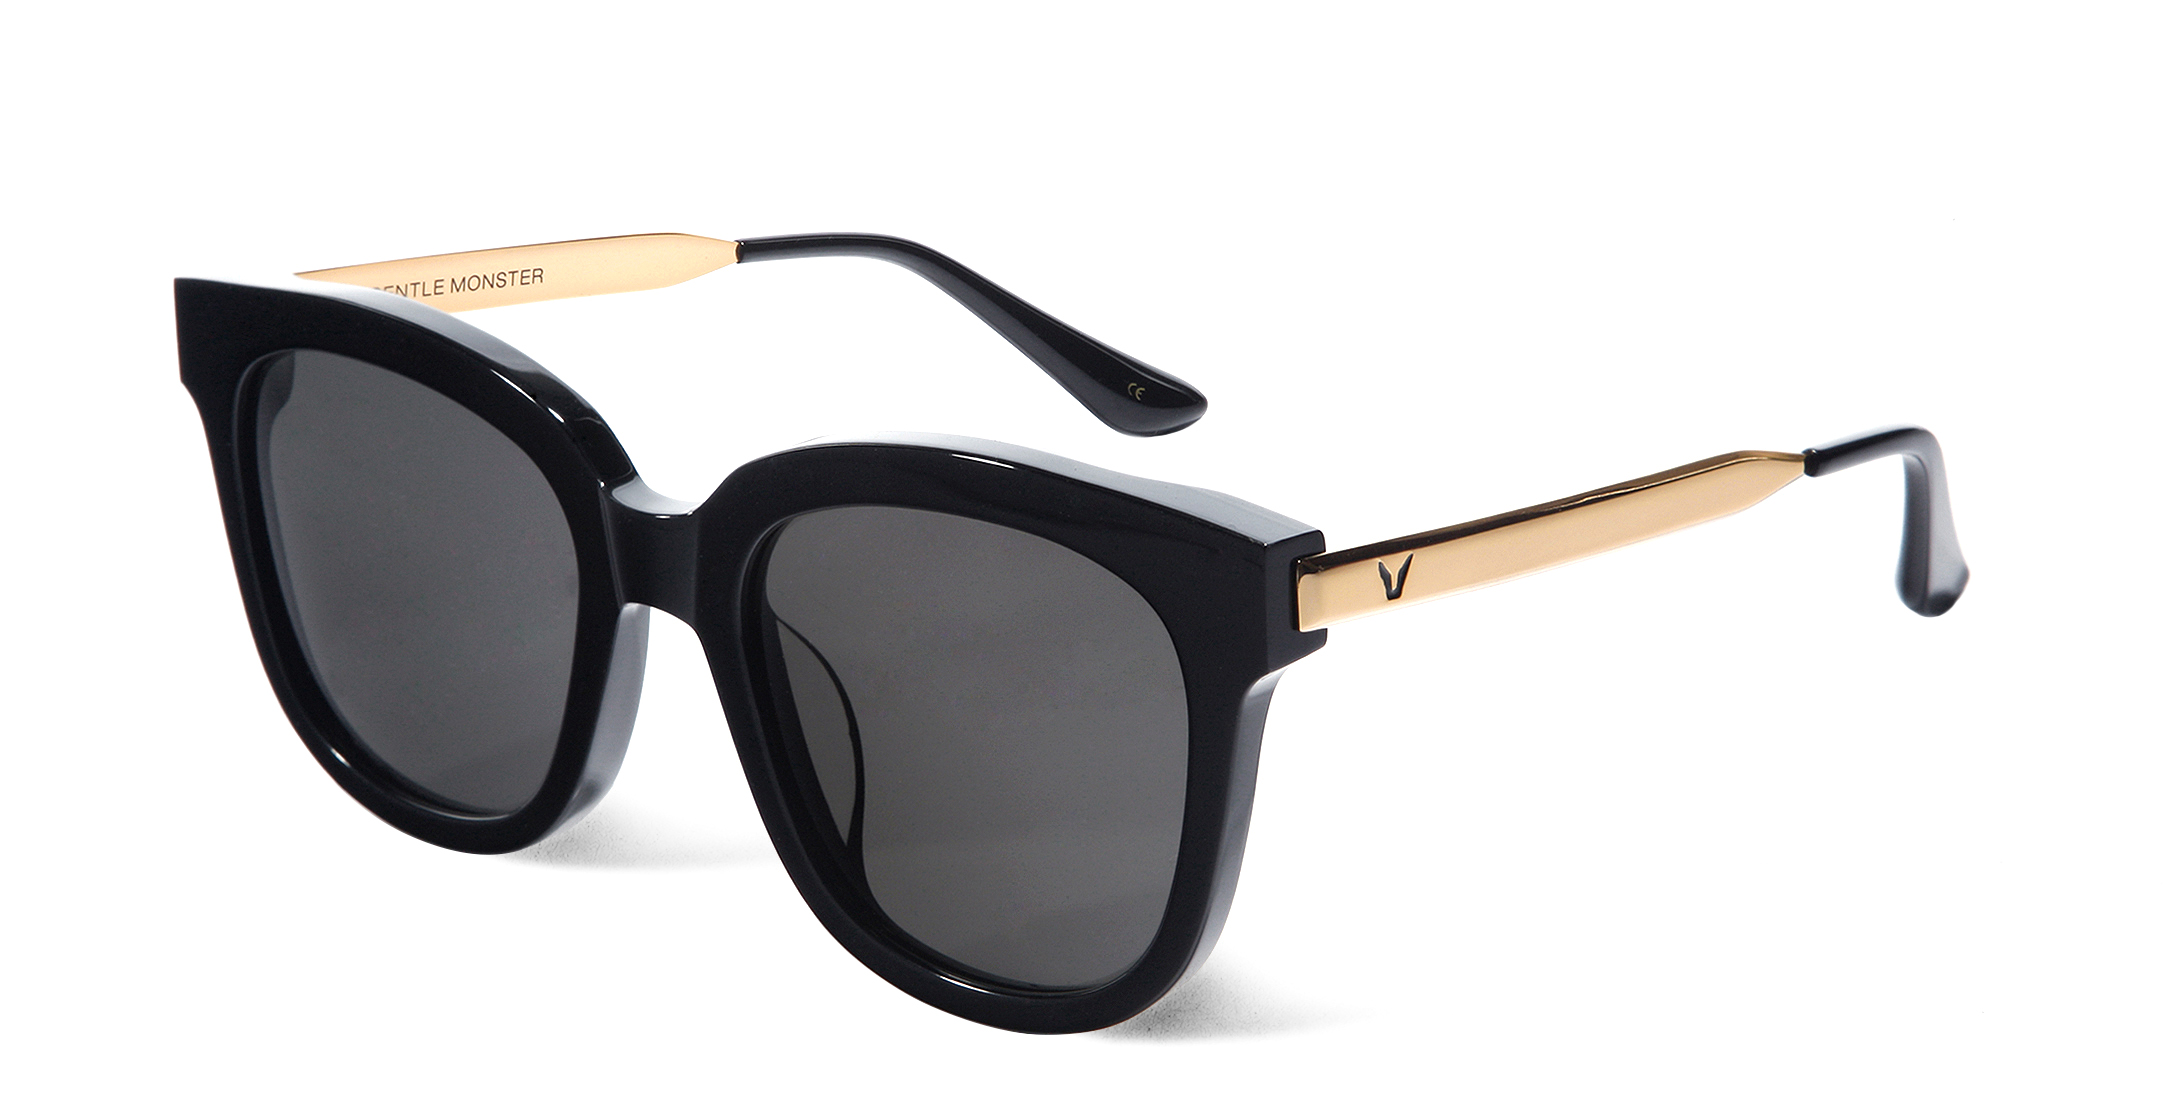 [韓劇看見味道的少女]#ABSENTE 01 GOLD 時尚品牌GENTLE MONSTER太陽眼鏡@K startree首爾星星樹